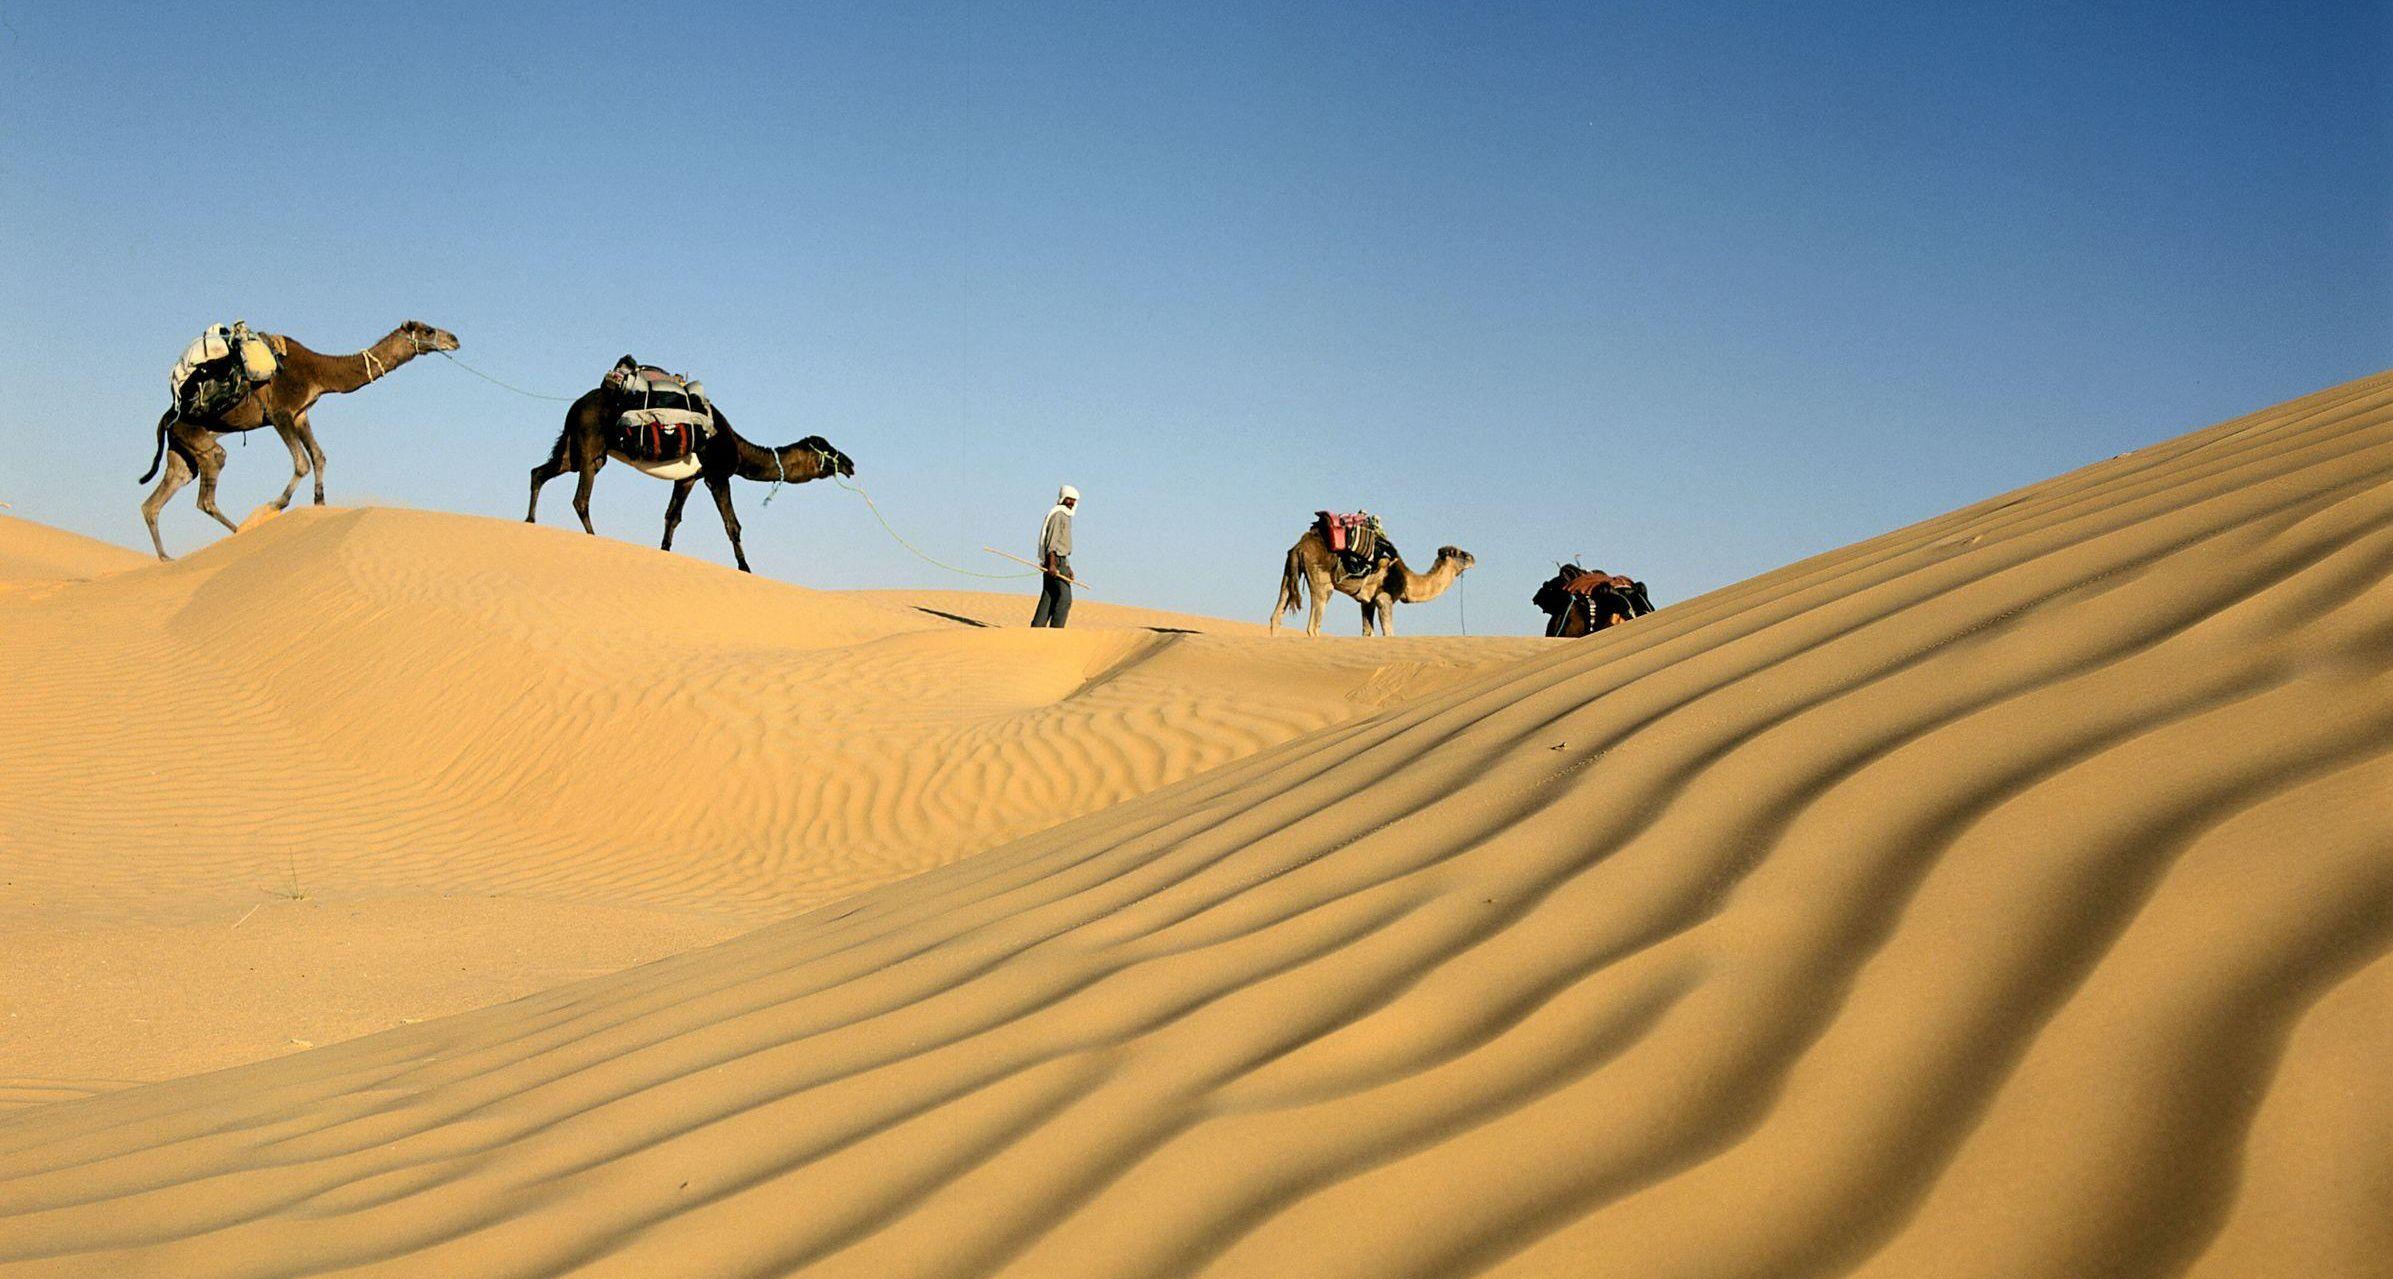 De Tozeur à Djerba